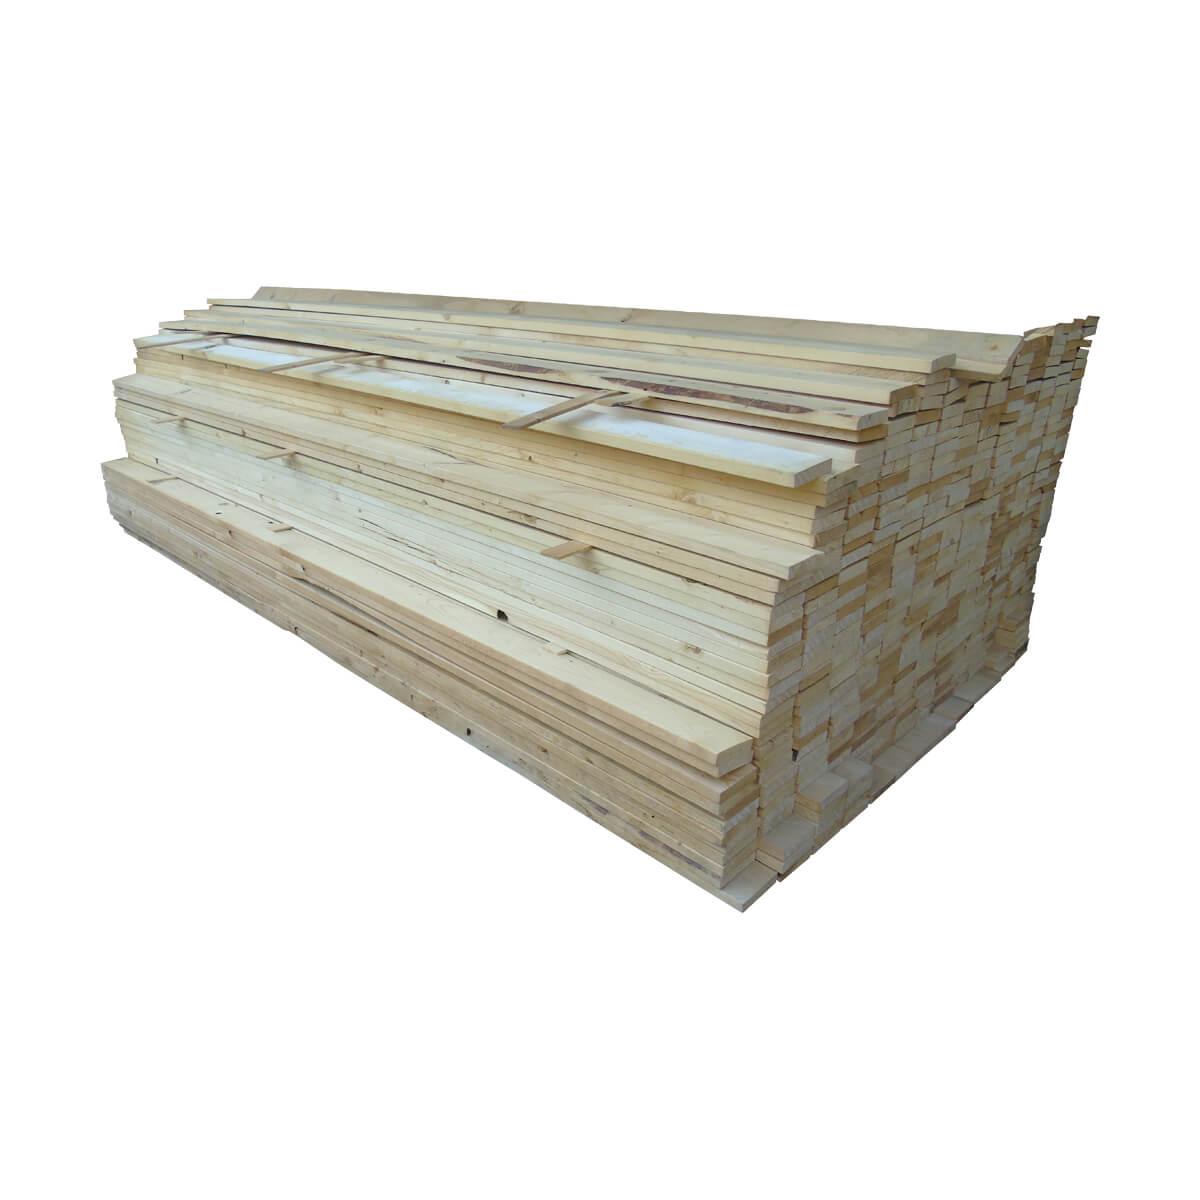 #3 Spruce Lumber - SPR #3 - 1 x 4 x 8-ft